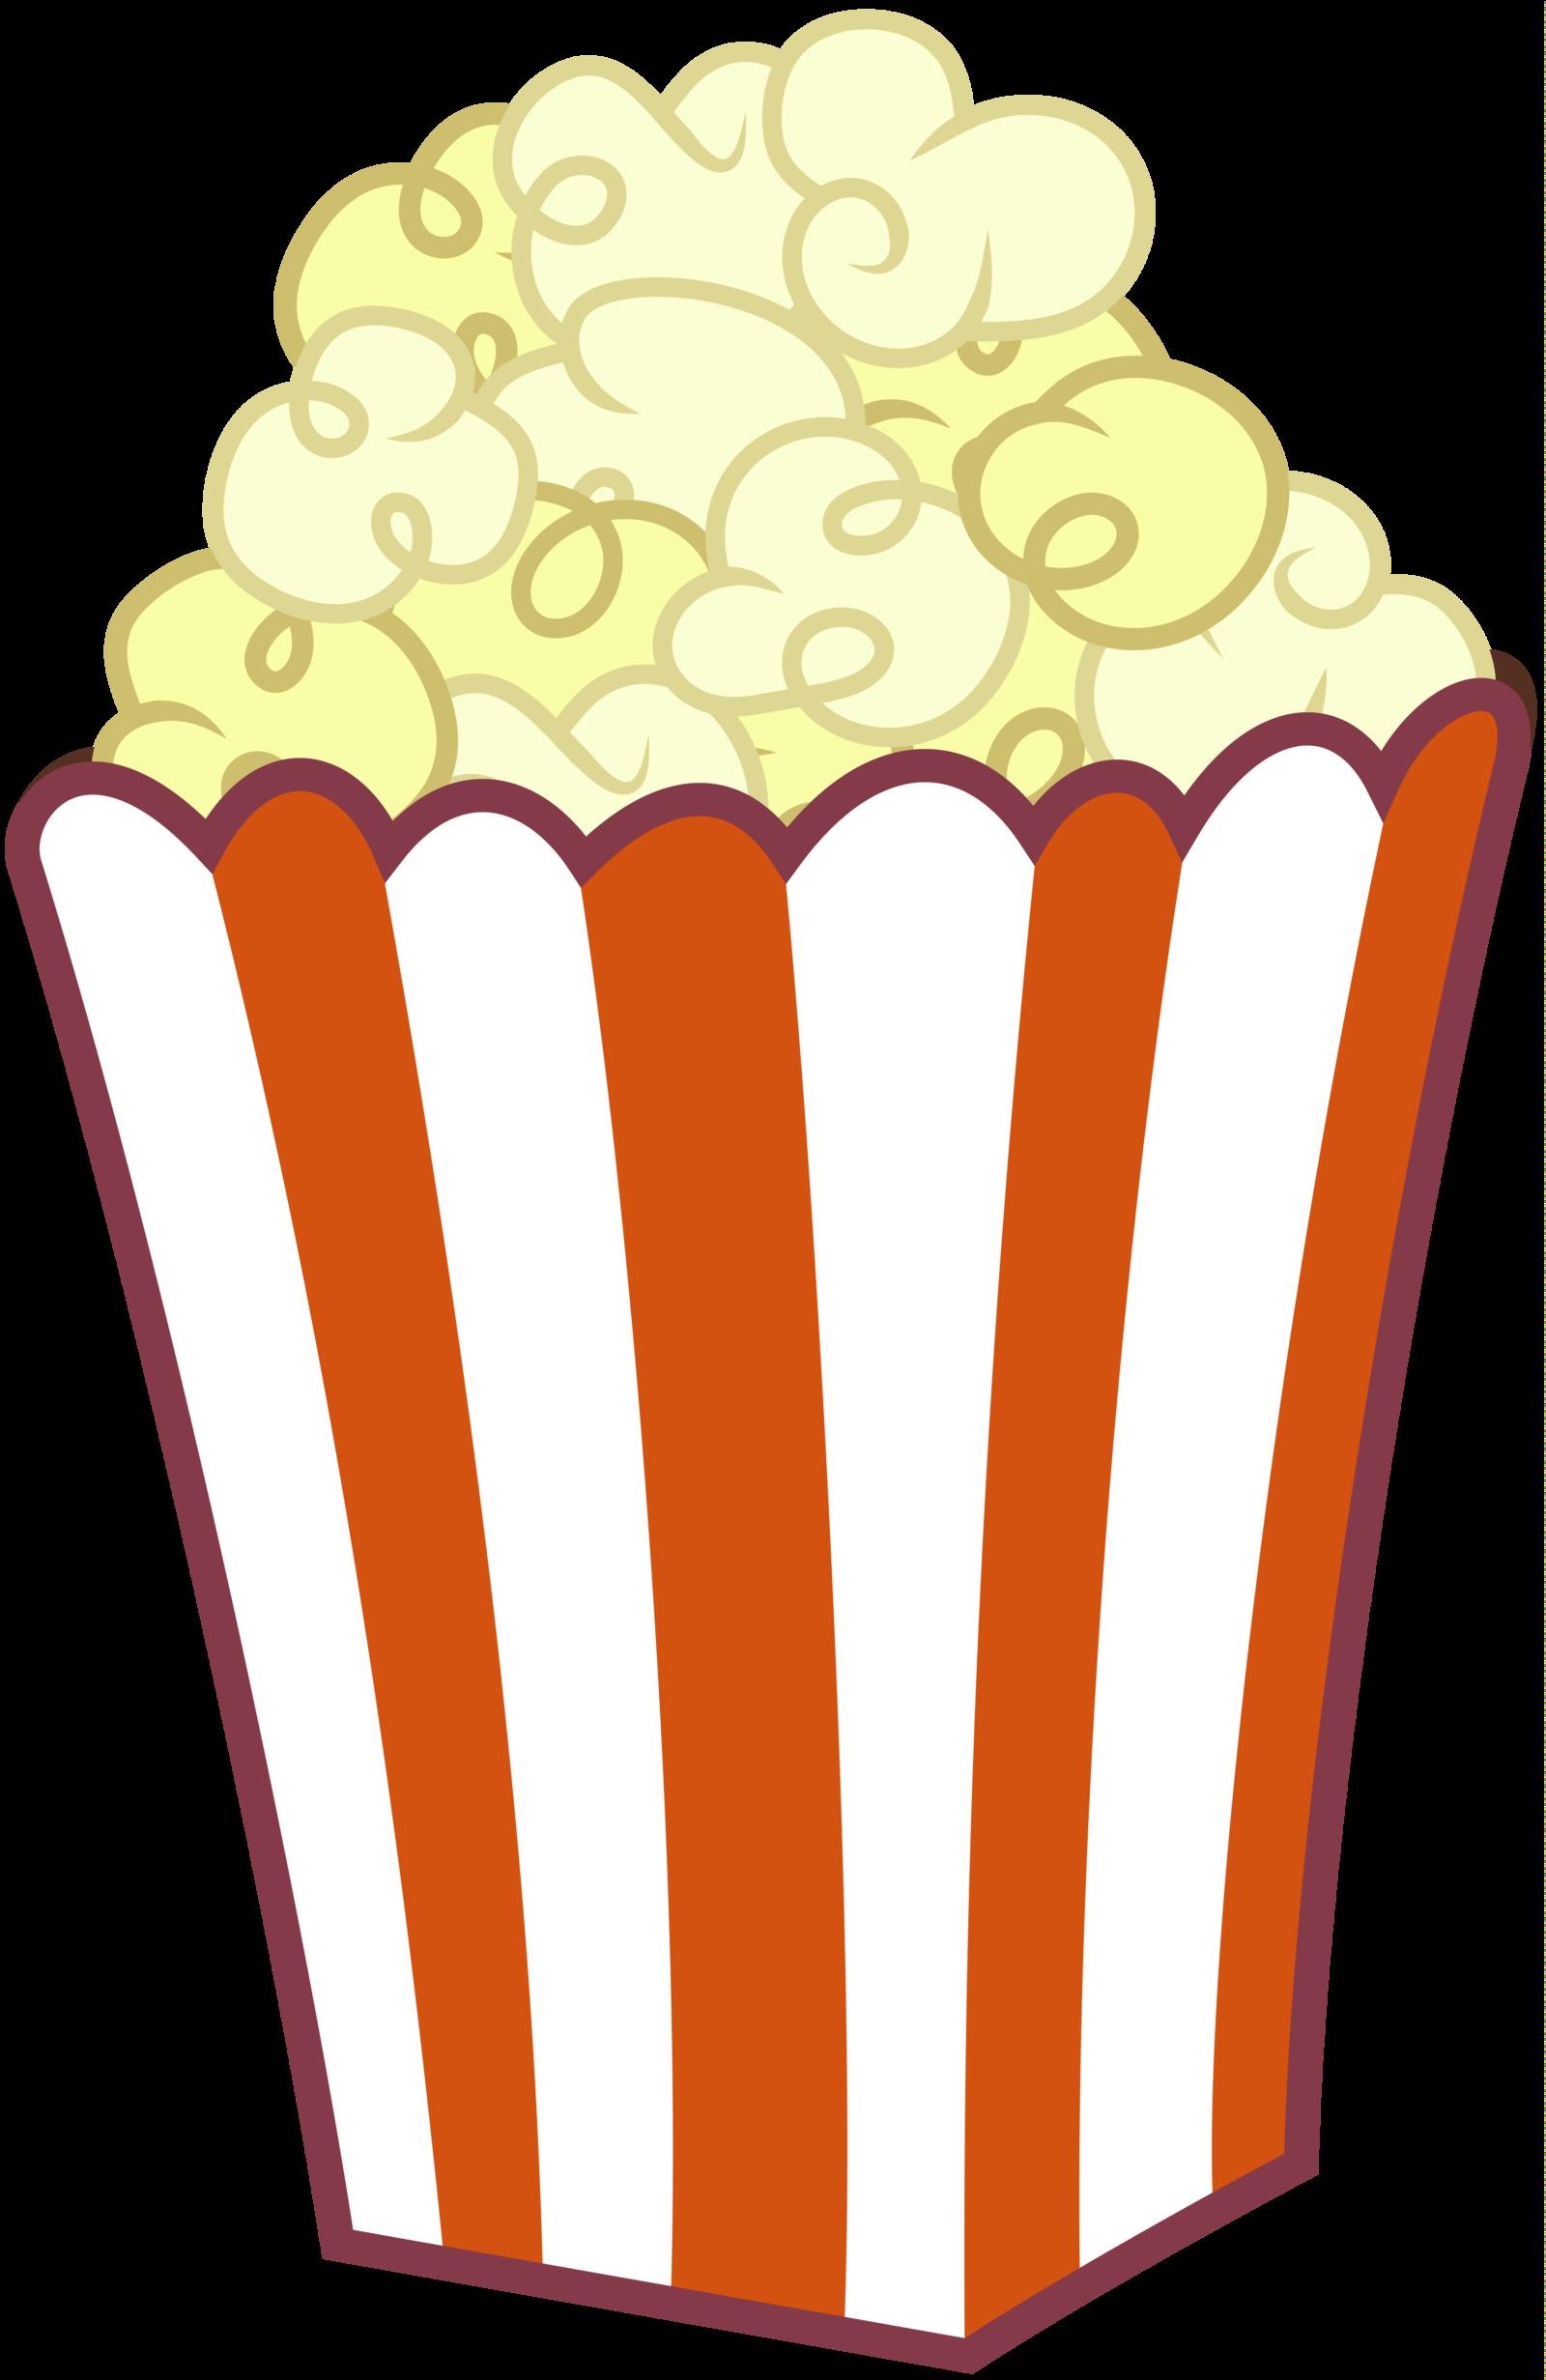 Popcorn kernel clipart transparent background clipartfest 4